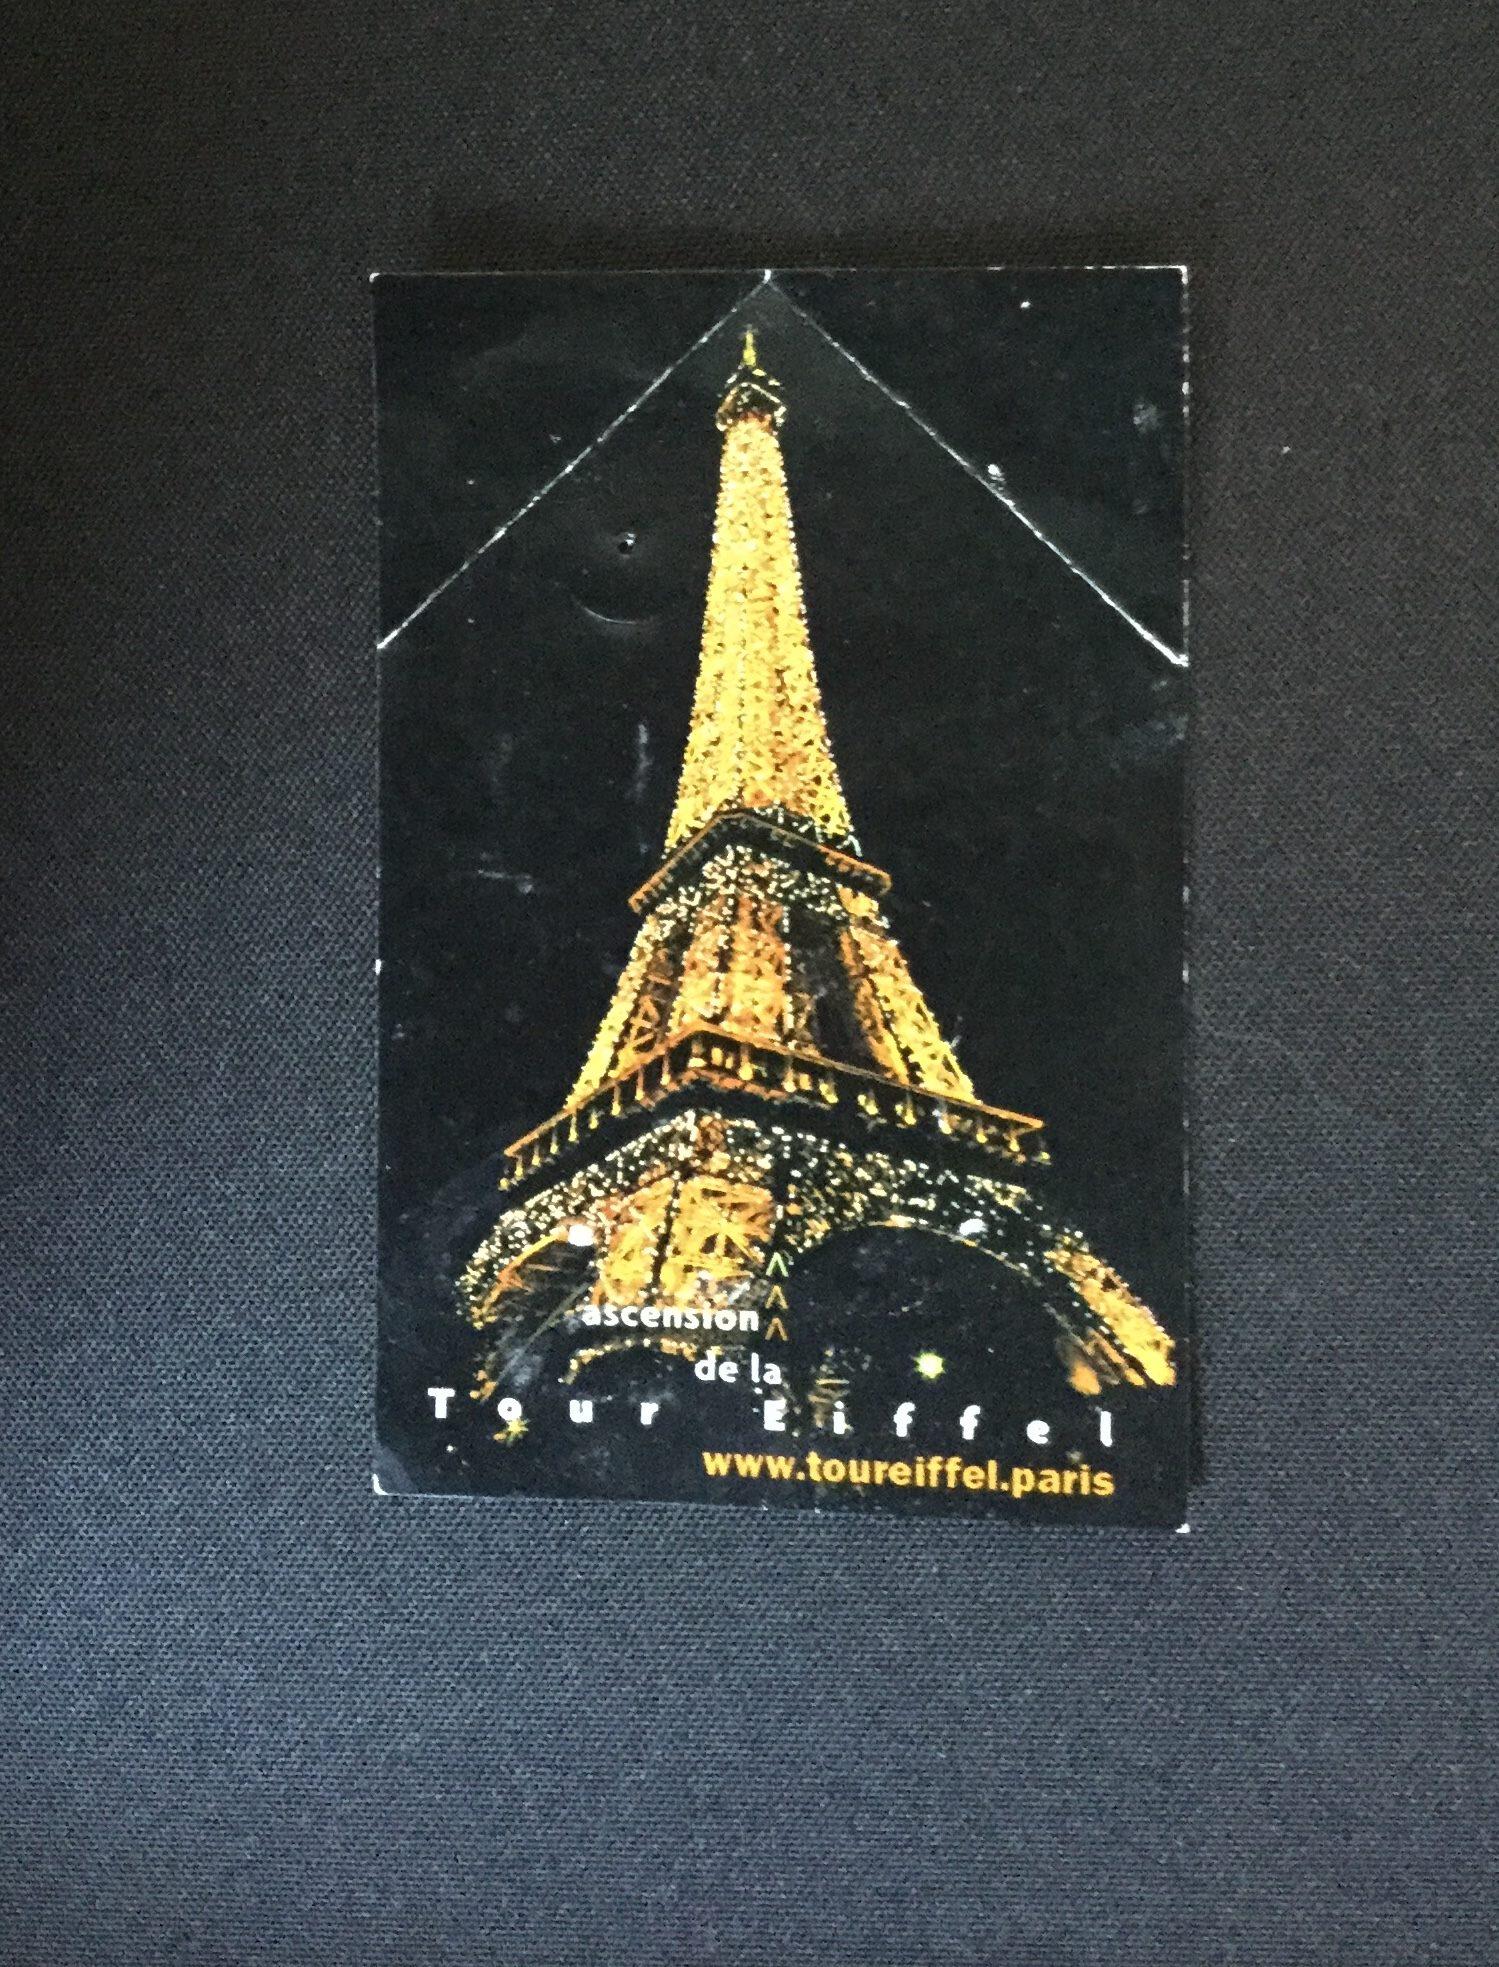 Eifell Tower ticket.jpg